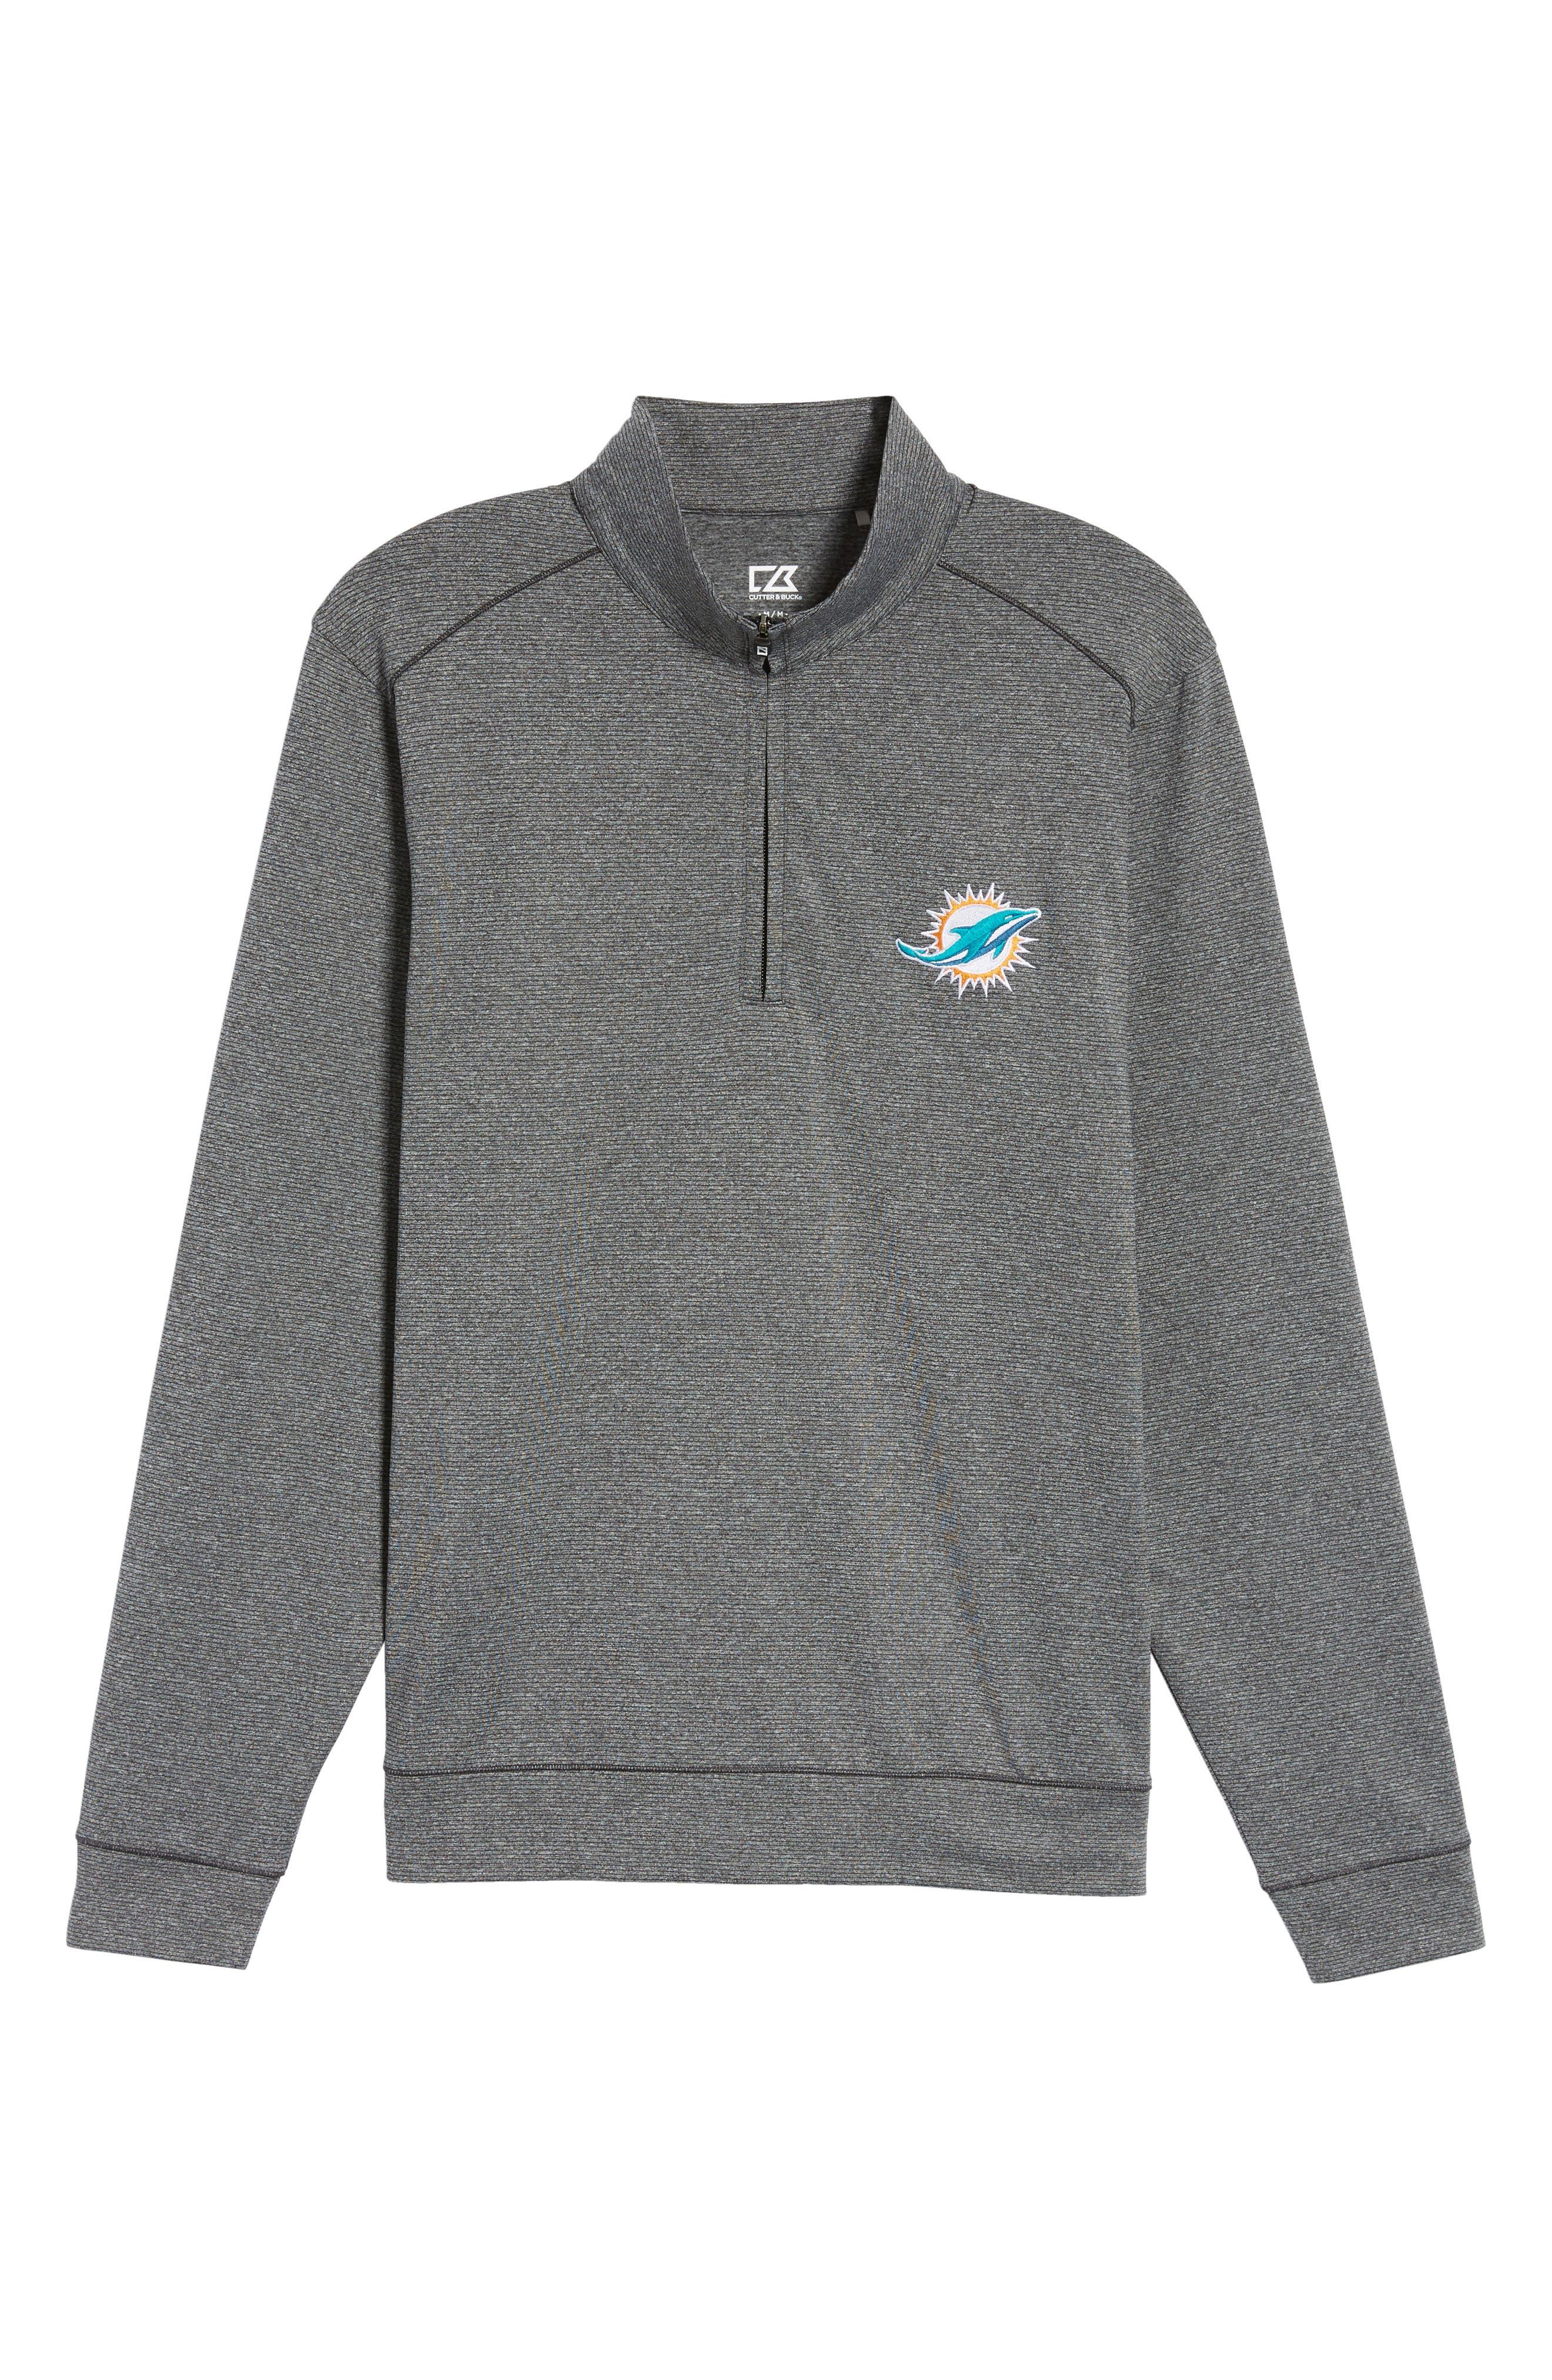 Shoreline - Miami Dolphins Half Zip Pullover,                             Alternate thumbnail 6, color,